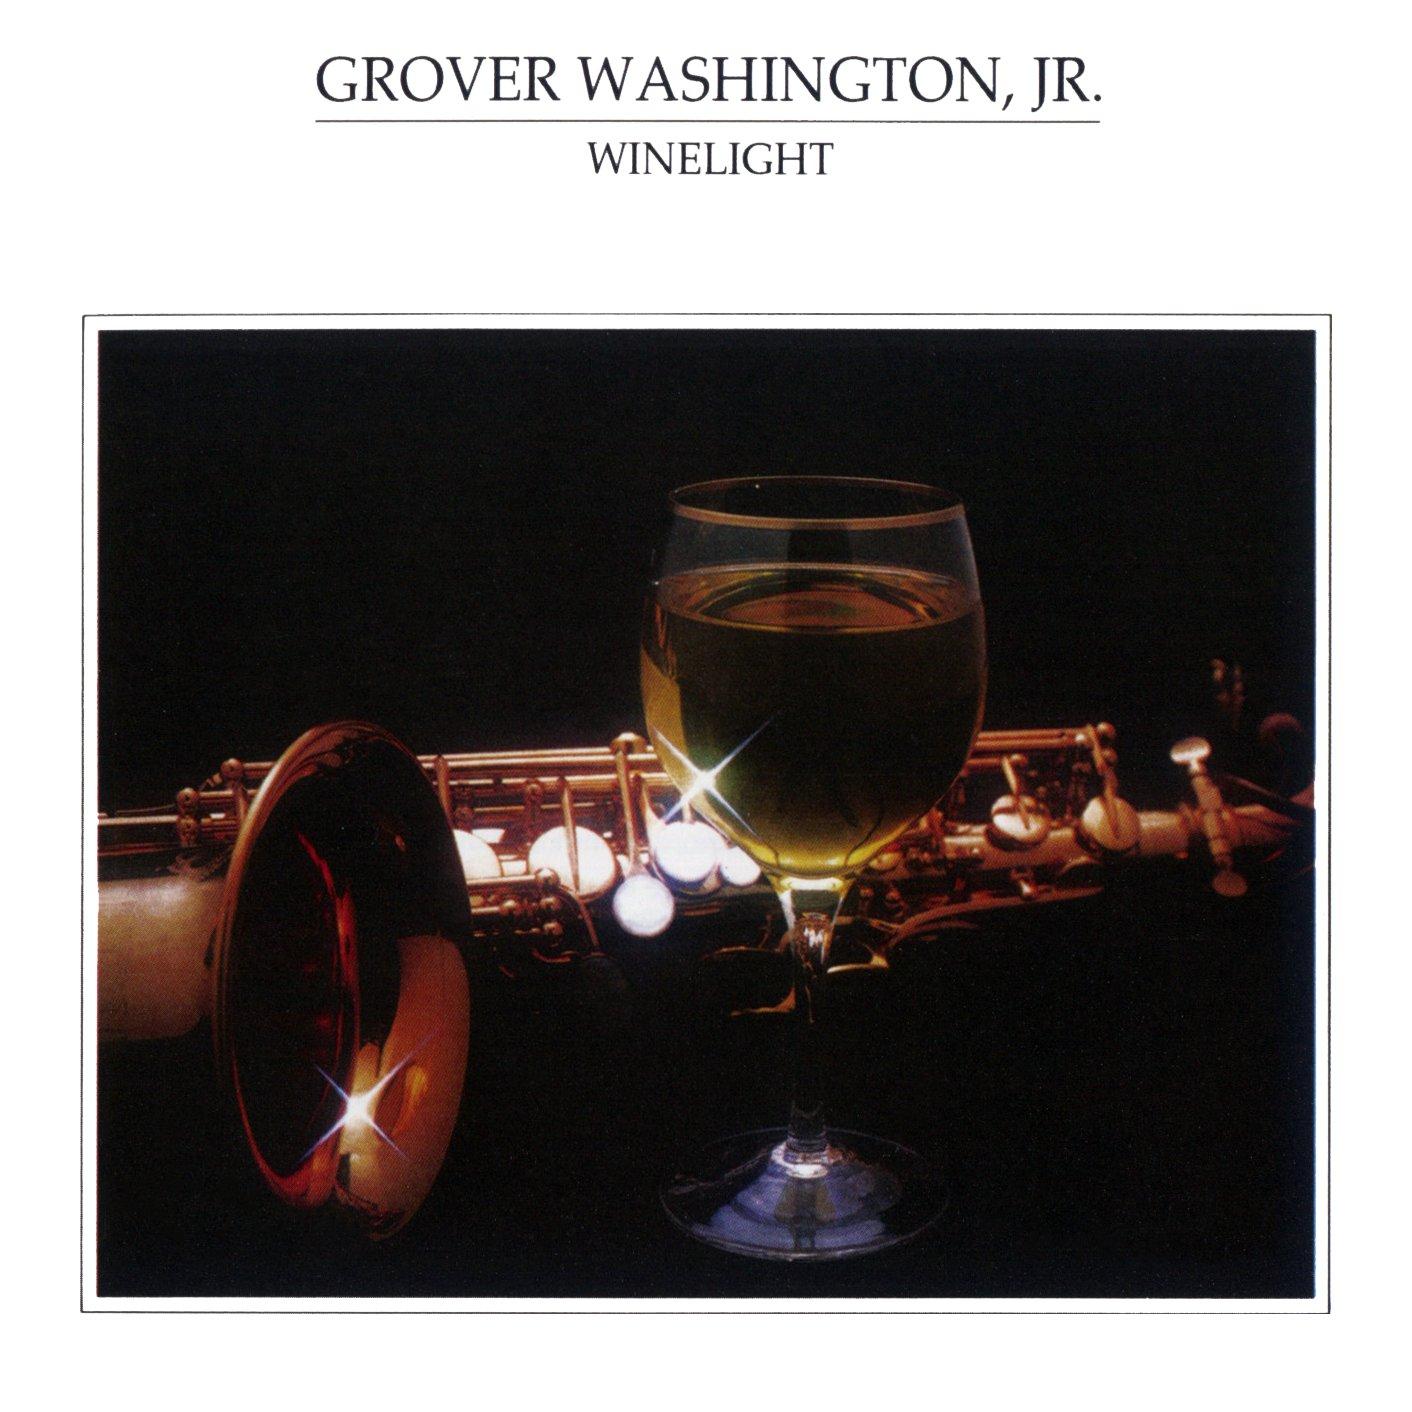 Winelight Grover Washington Jr Last Fm